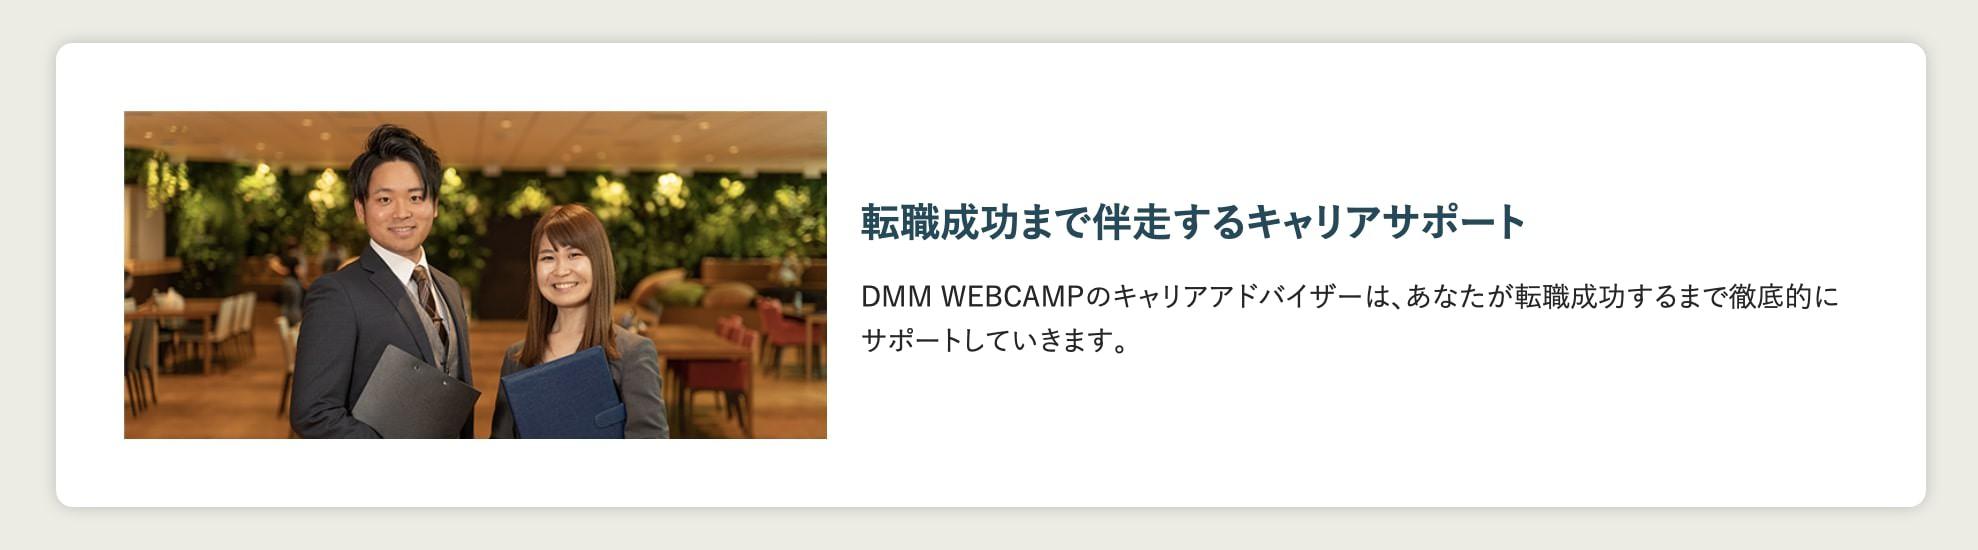 DMMWEBキャンプのキャリアサポート